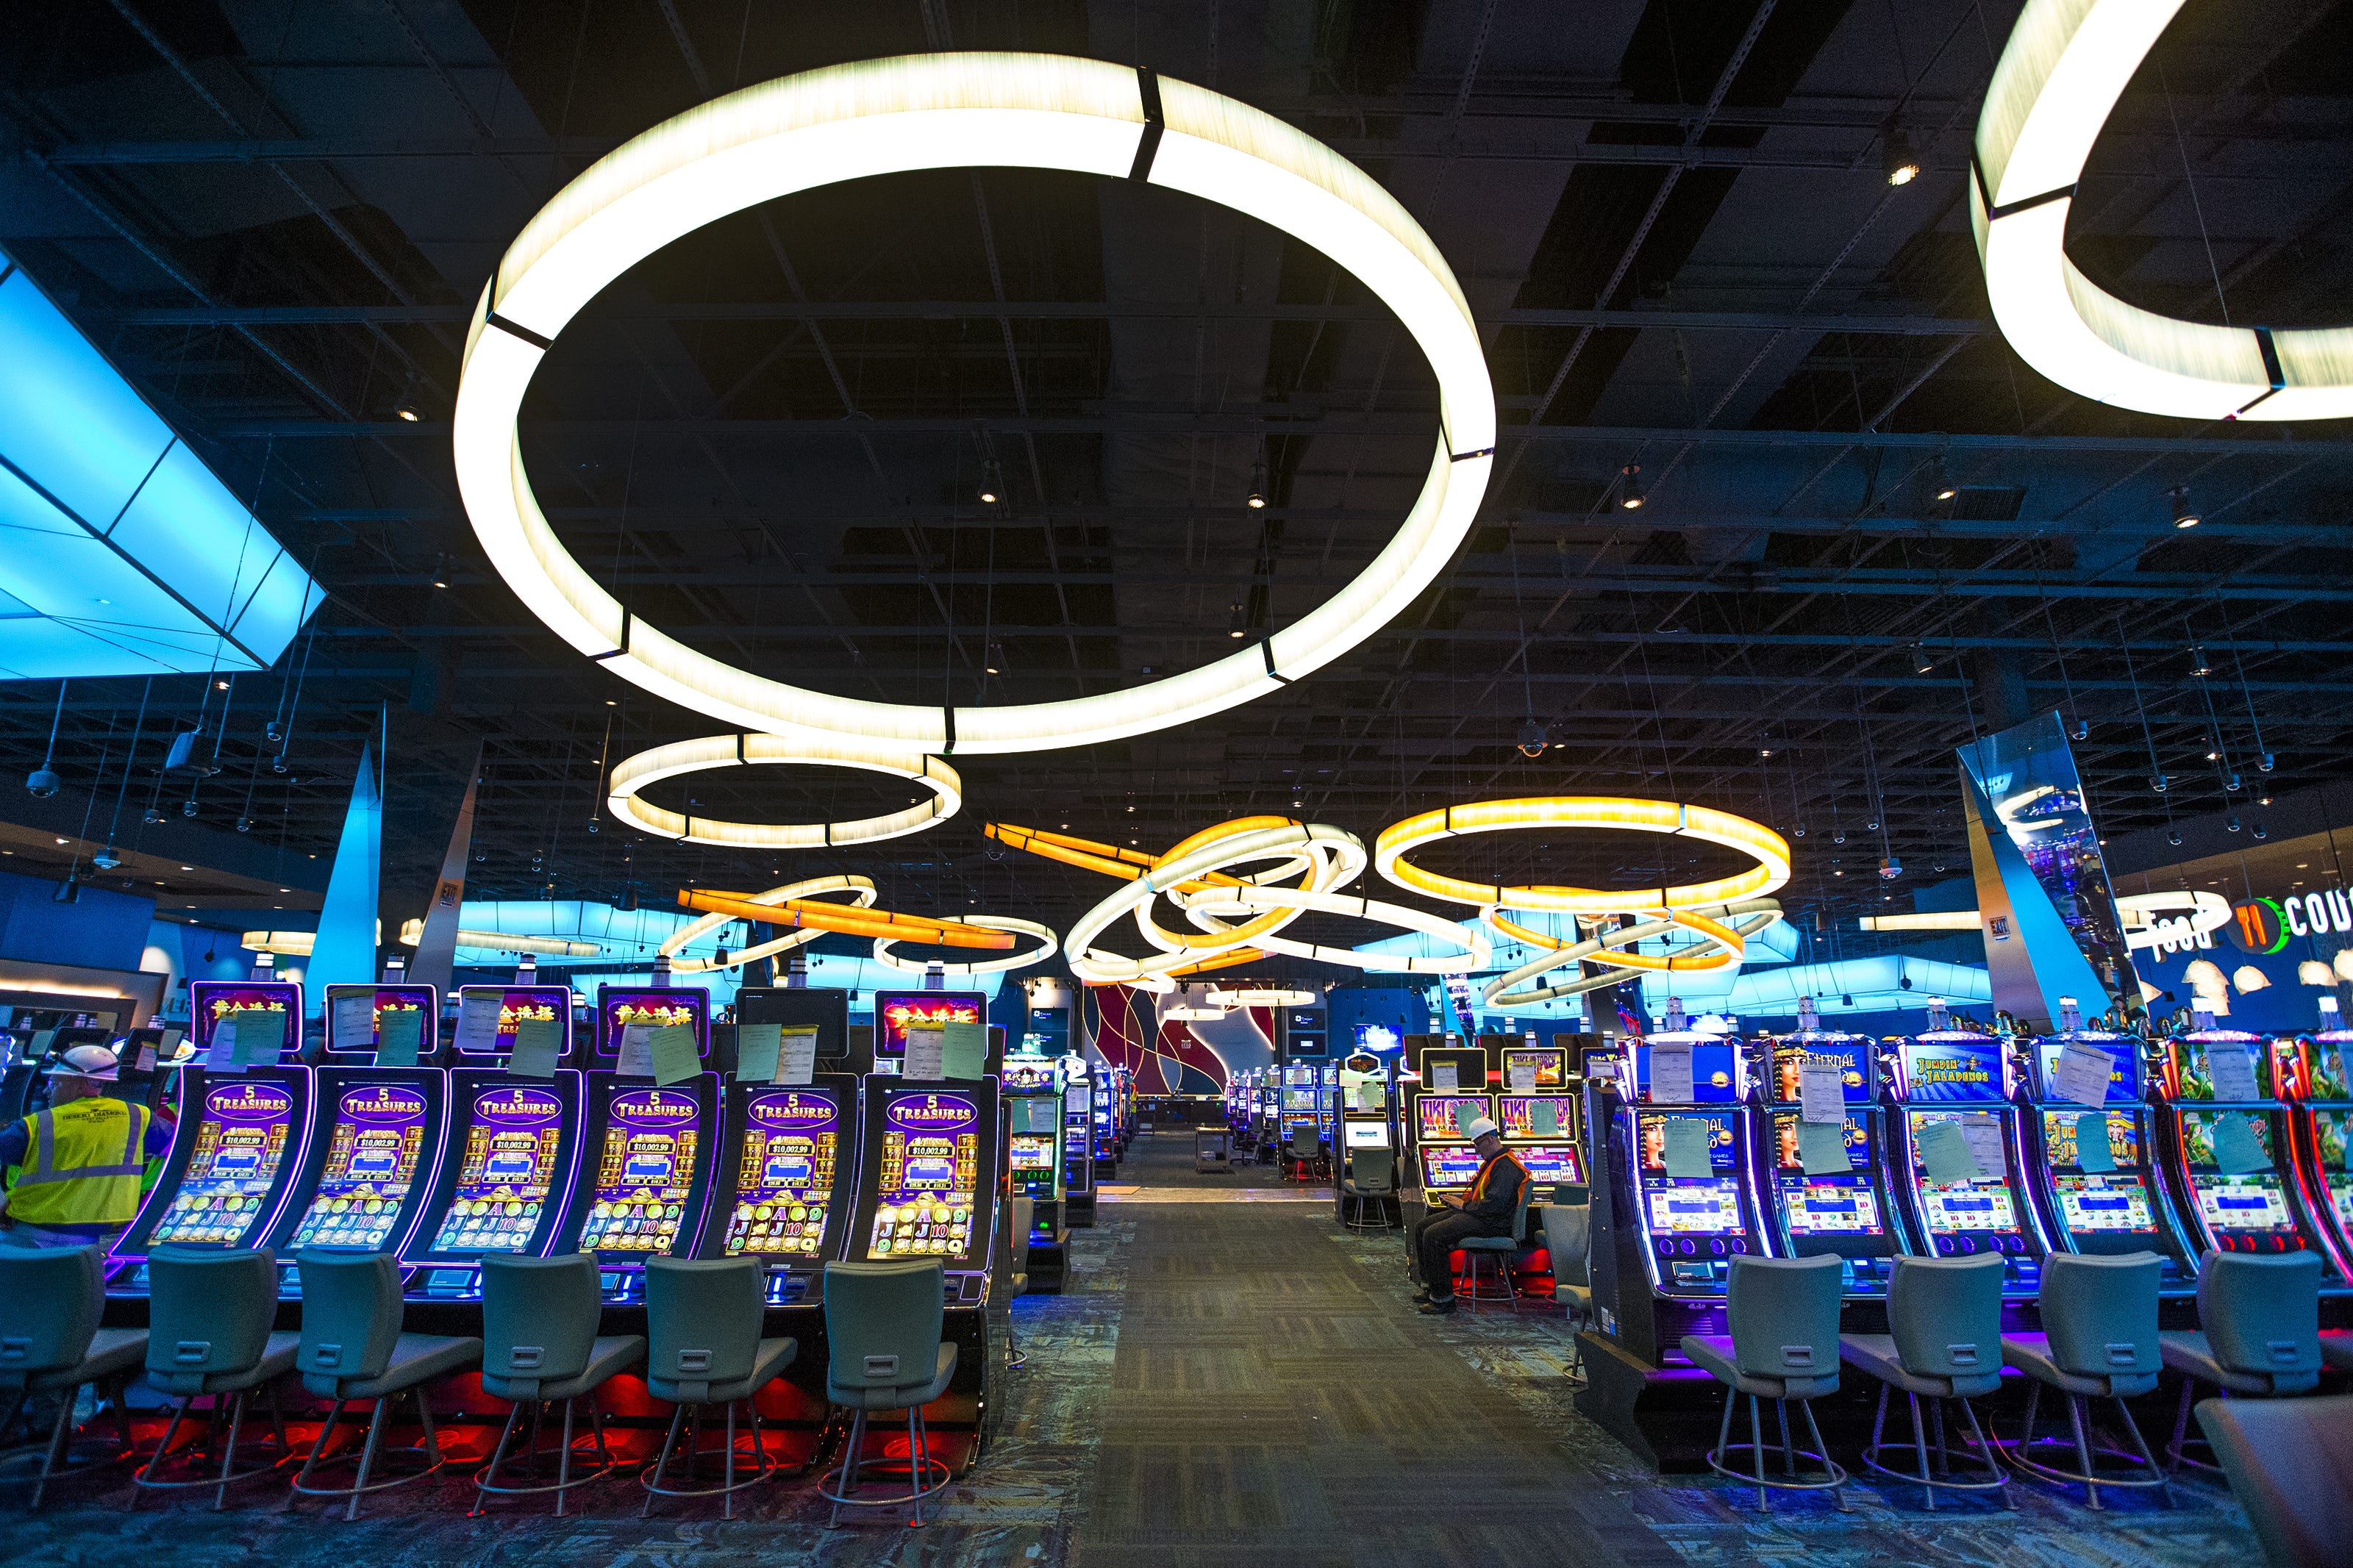 Casino companion des moines iowa buy online gambling web site